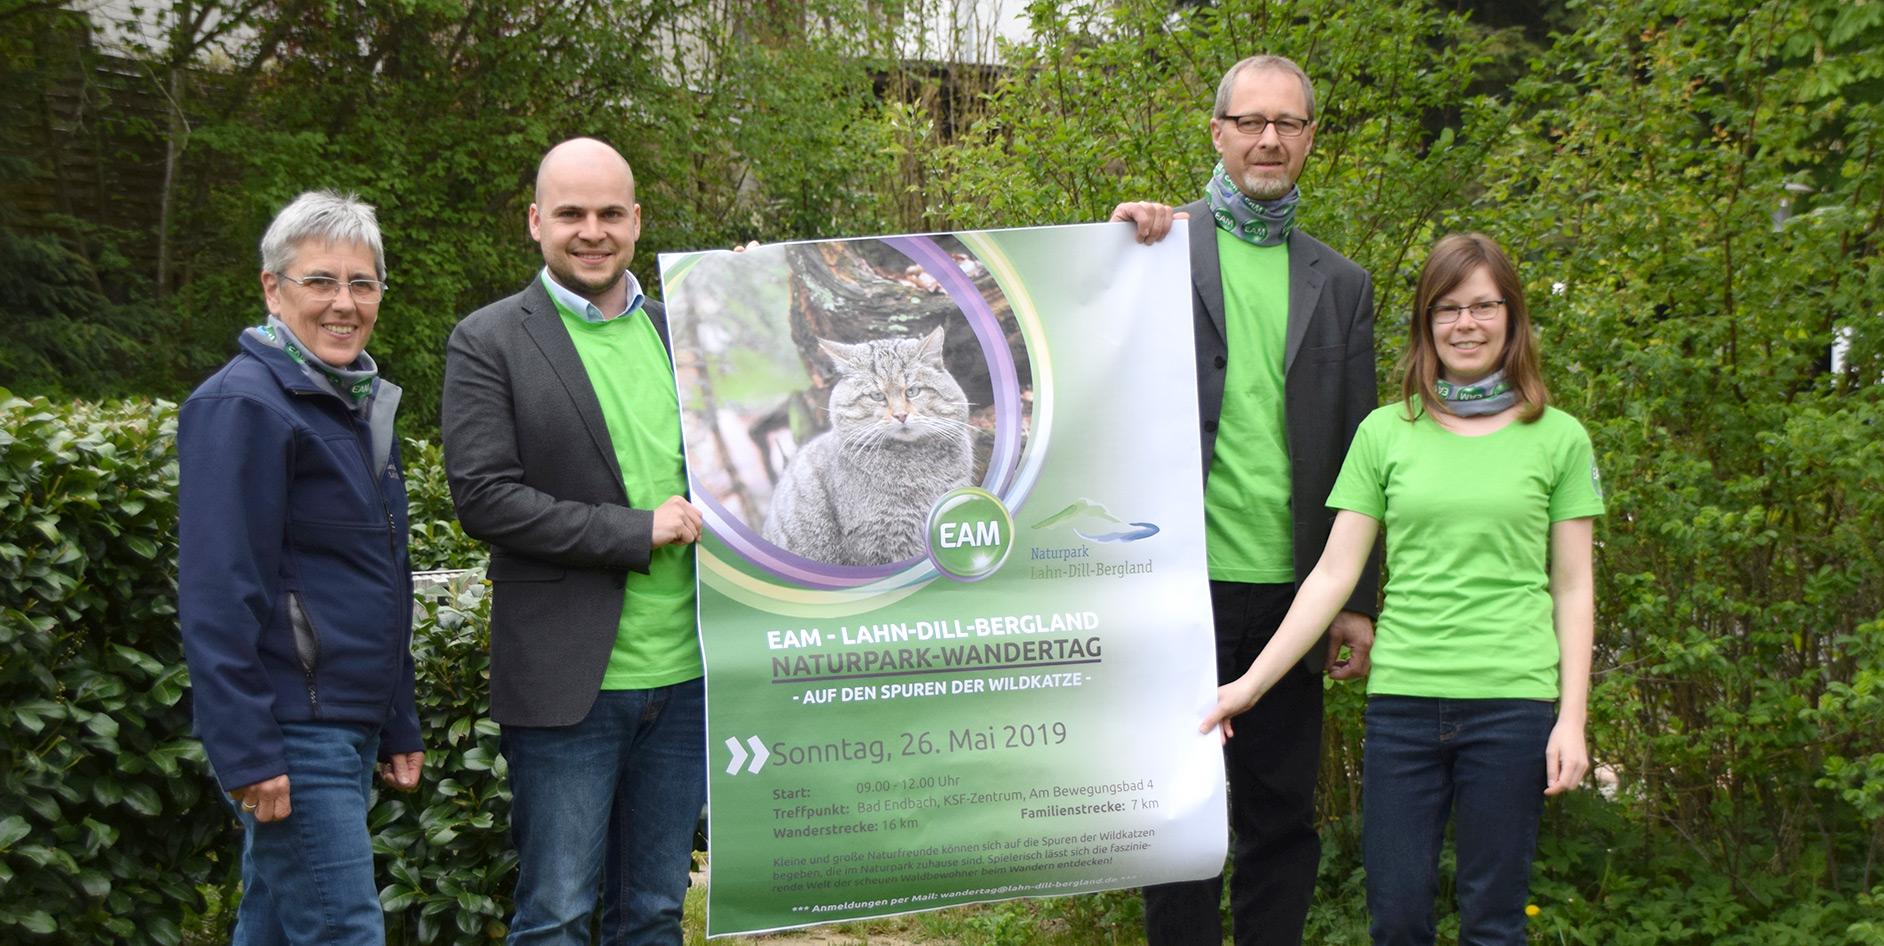 "Die EAM ist Premiumsponsor beim ""EAM – Lahn-Dill-Bergland Naturpark-Wandertag"" in Bad Endbach."